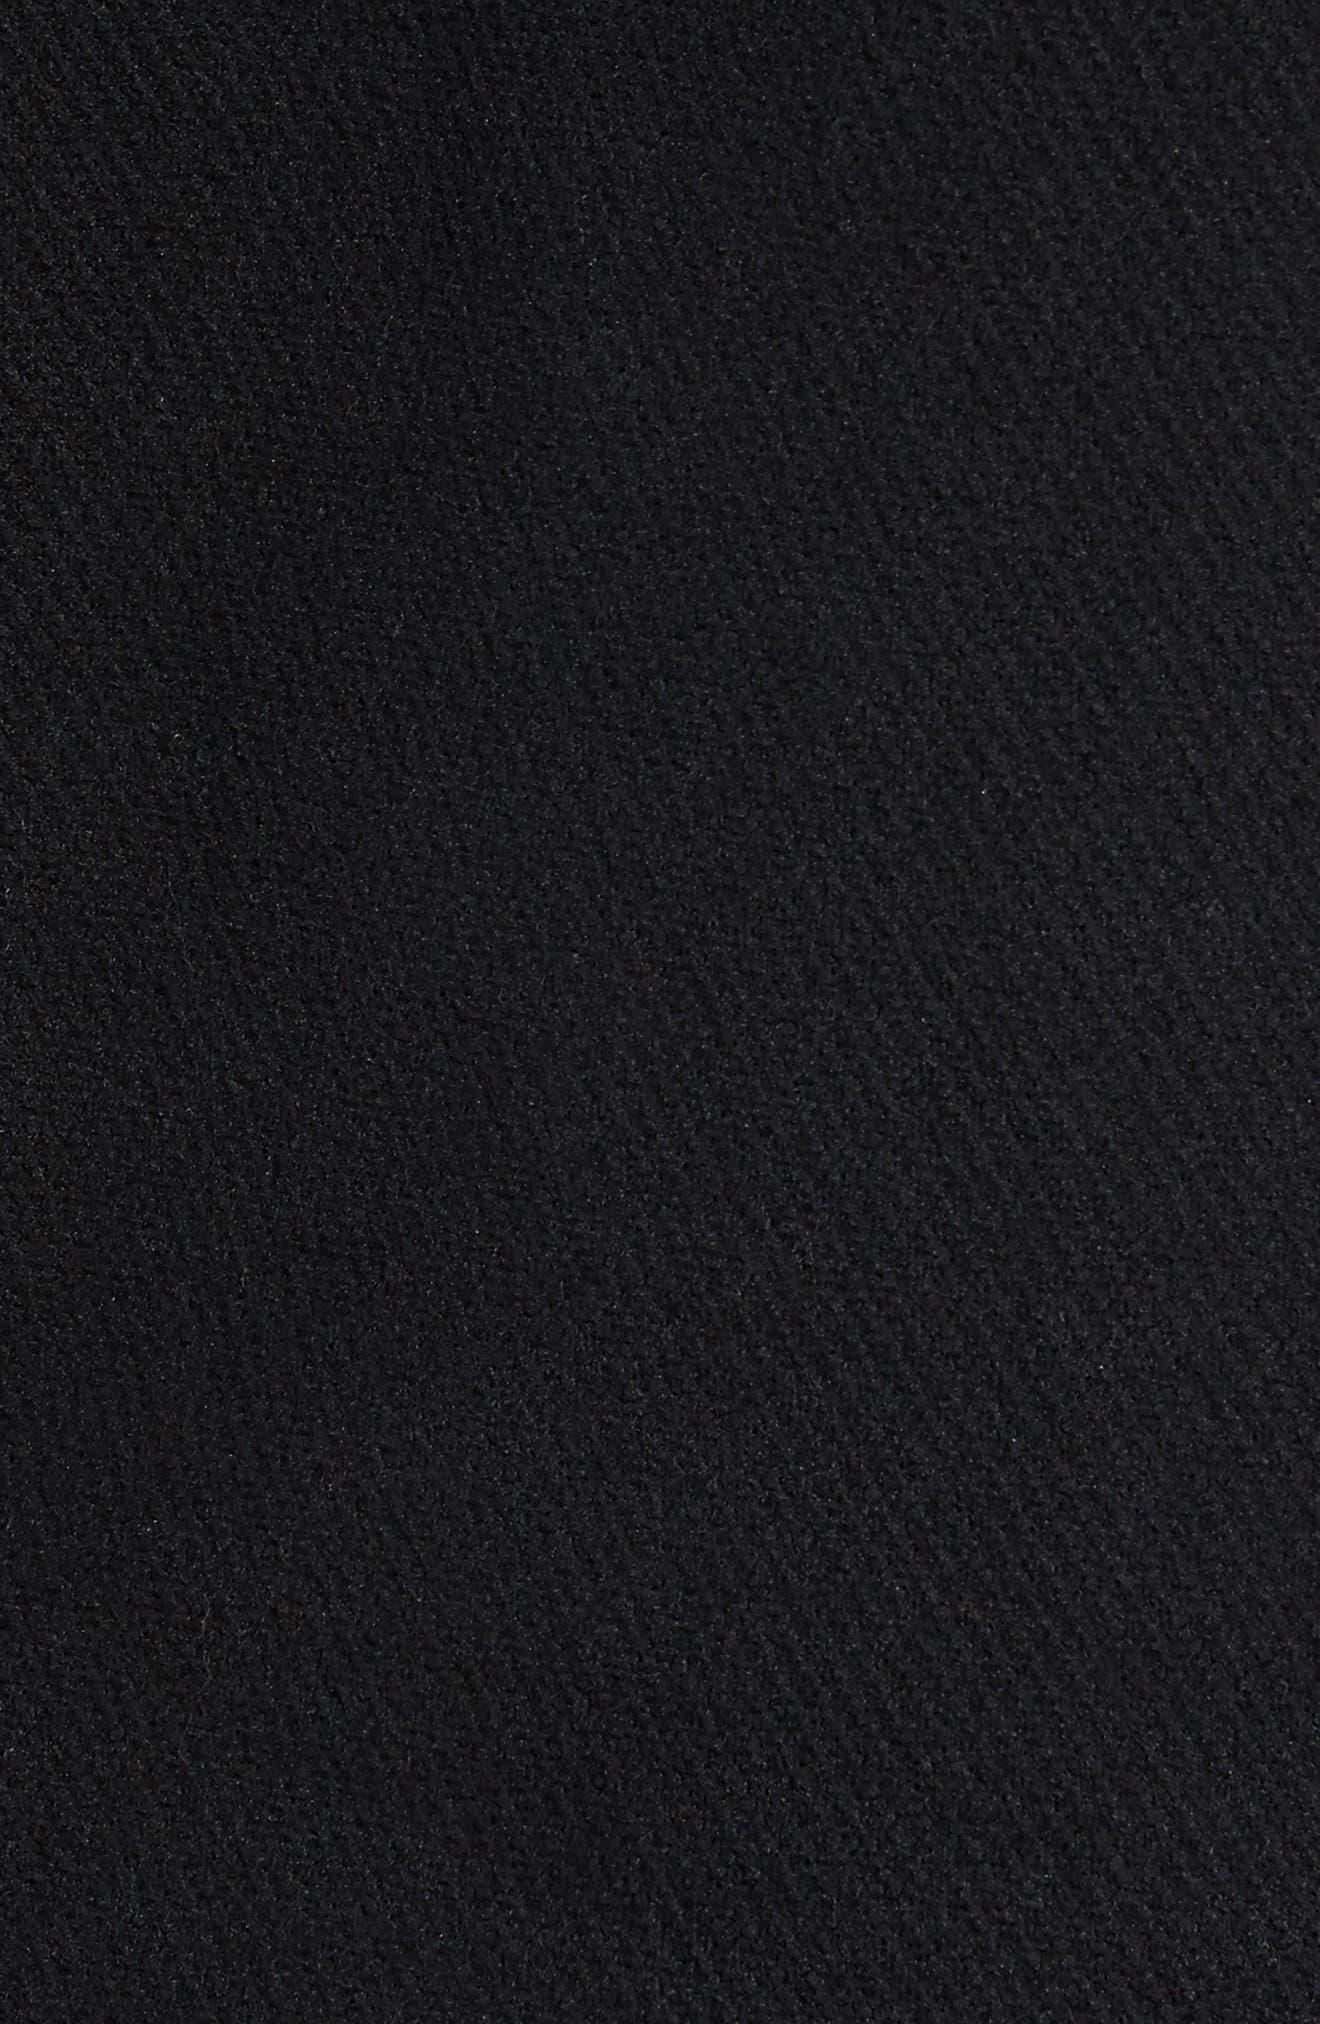 Quarter Zip Fleece Pullover,                             Alternate thumbnail 5, color,                             Black Caviar